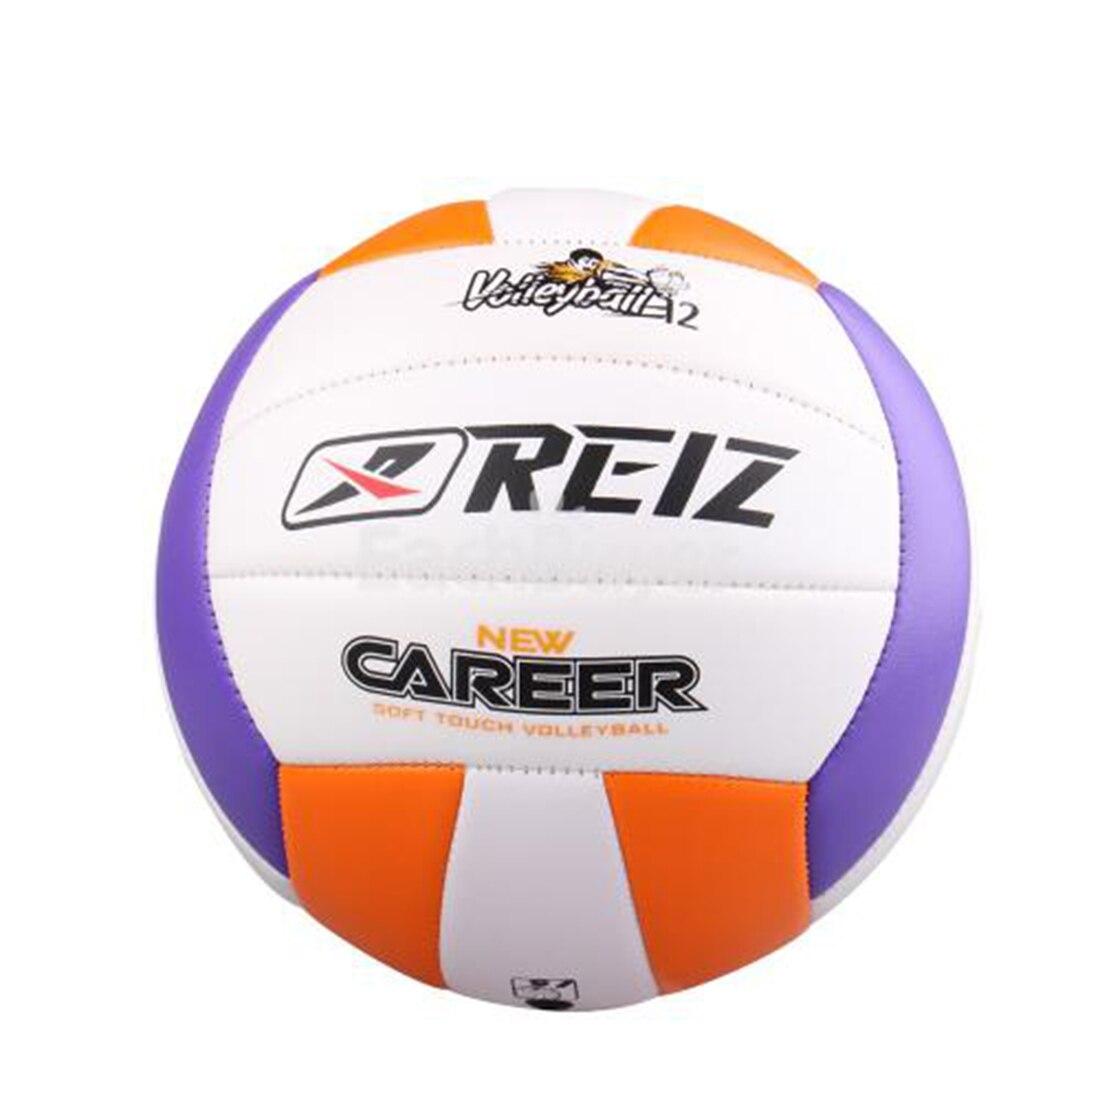 Venta caliente Soft Touch Volleyball Ball Tamaño 5 partido calidad Voleibol Pelota de entrenamiento interior y exterior con bolsa de red + boca de aire